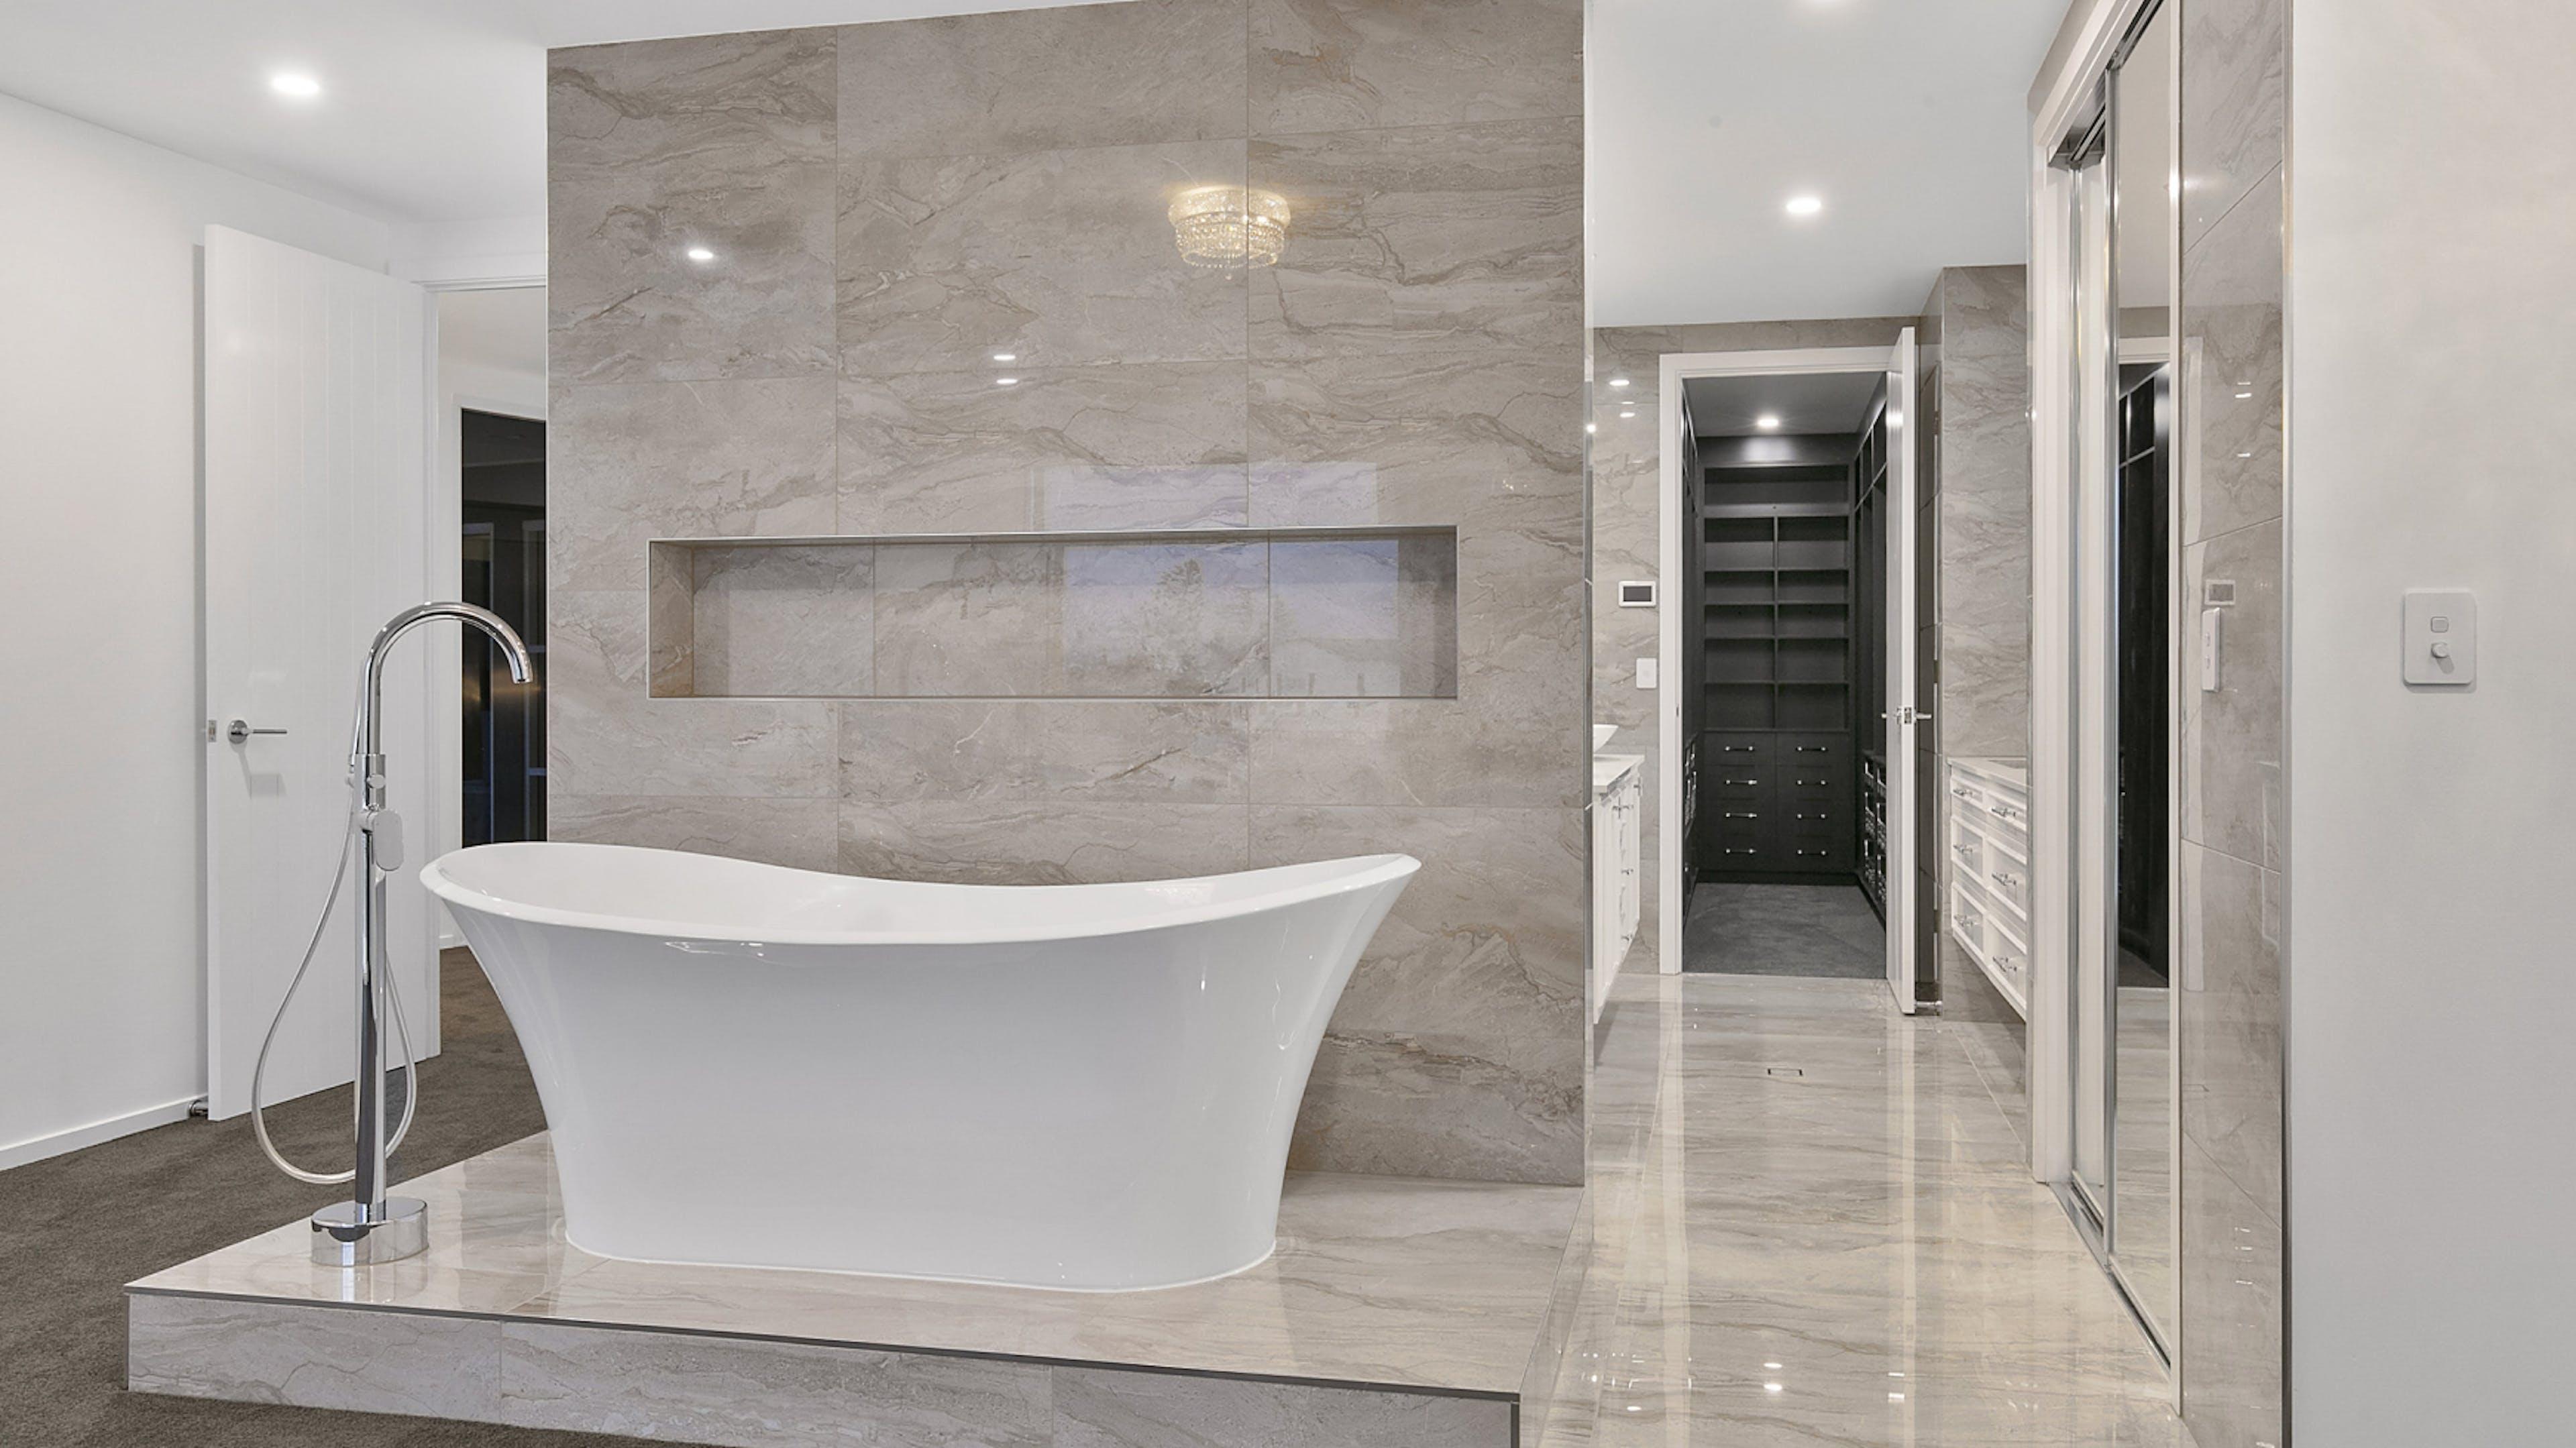 A modern, luxurious bathroom remodelling including high end bathtub done by Streamline Cabinets.